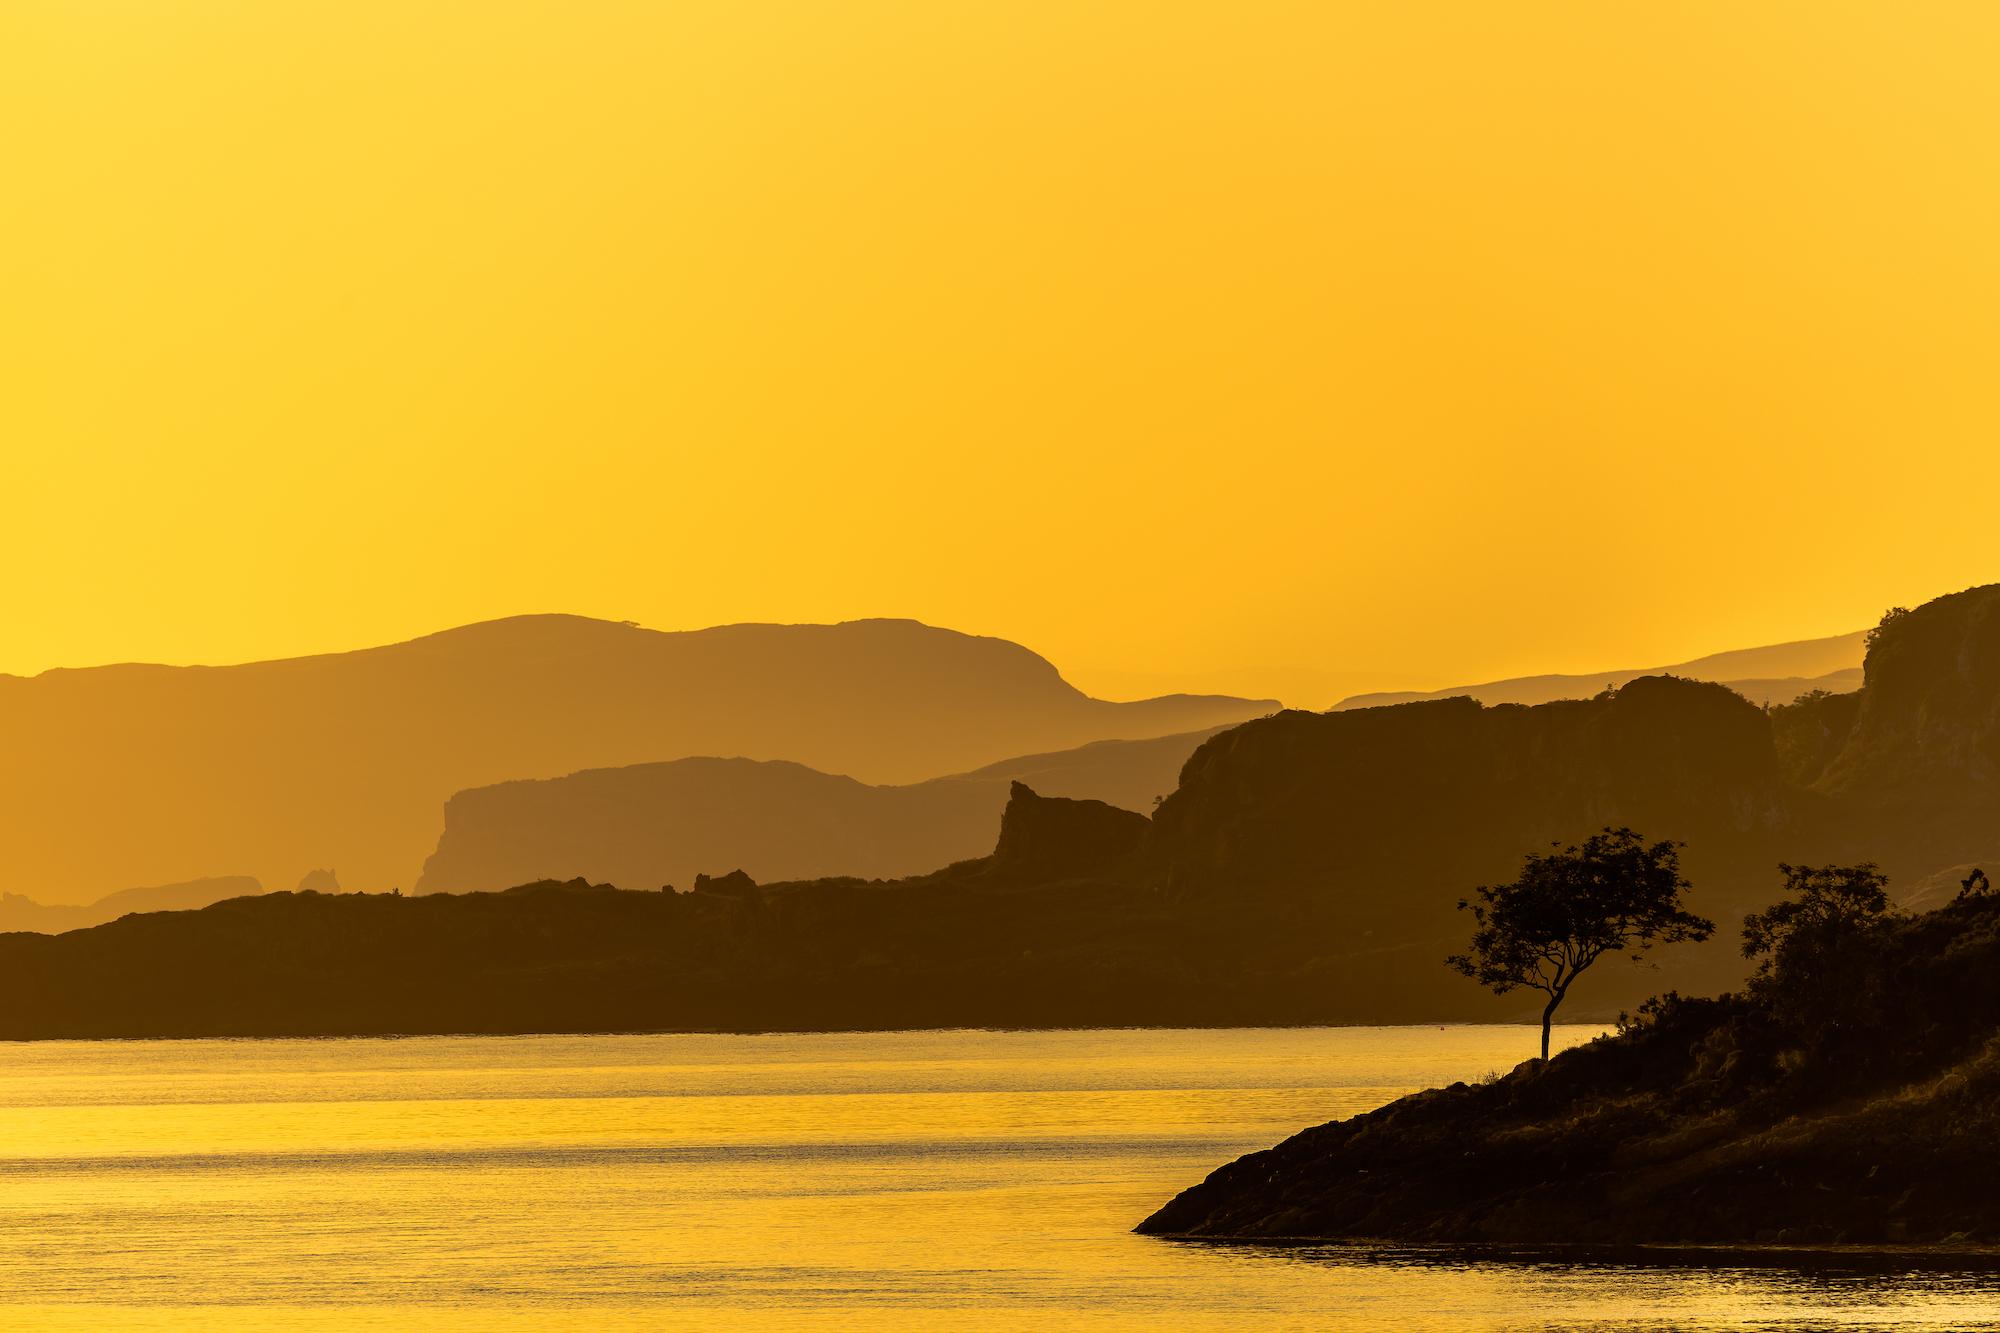 (660) Loch Feochan at Sunset, Oban, Argll and Bute, Scotland.jpg